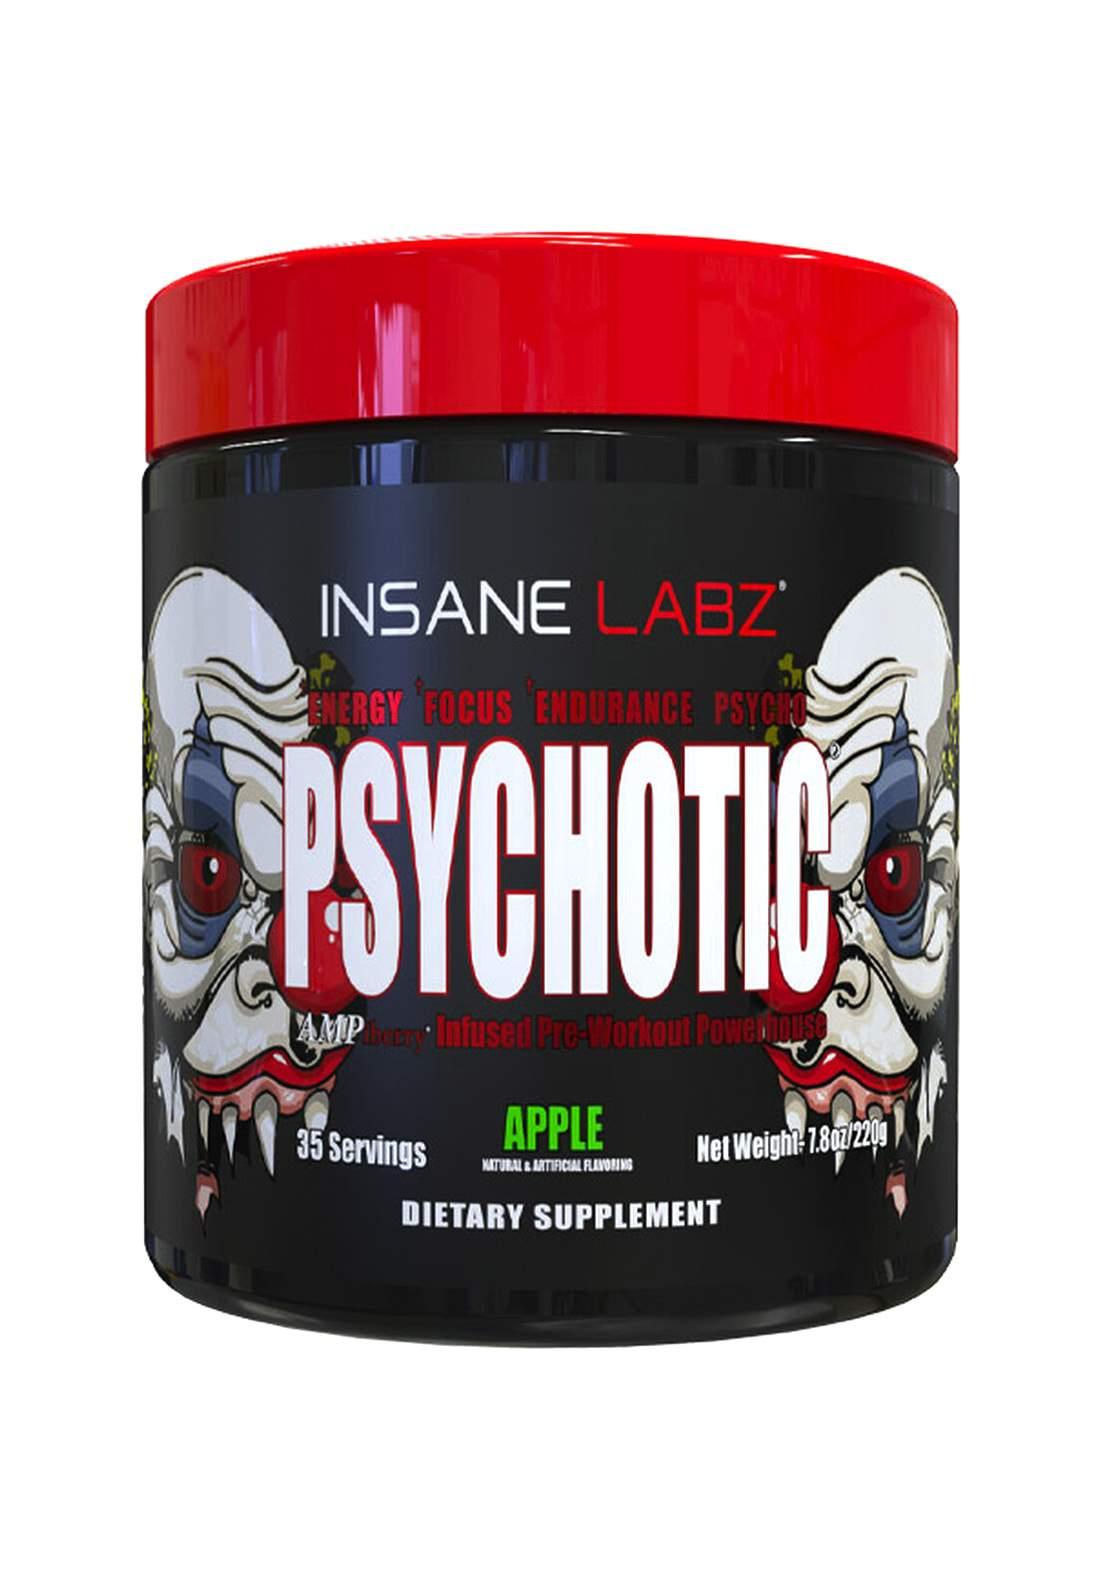 Insane Labz Psychotic Apple 35 Servings 220 Gm  منشط أداء رياضي